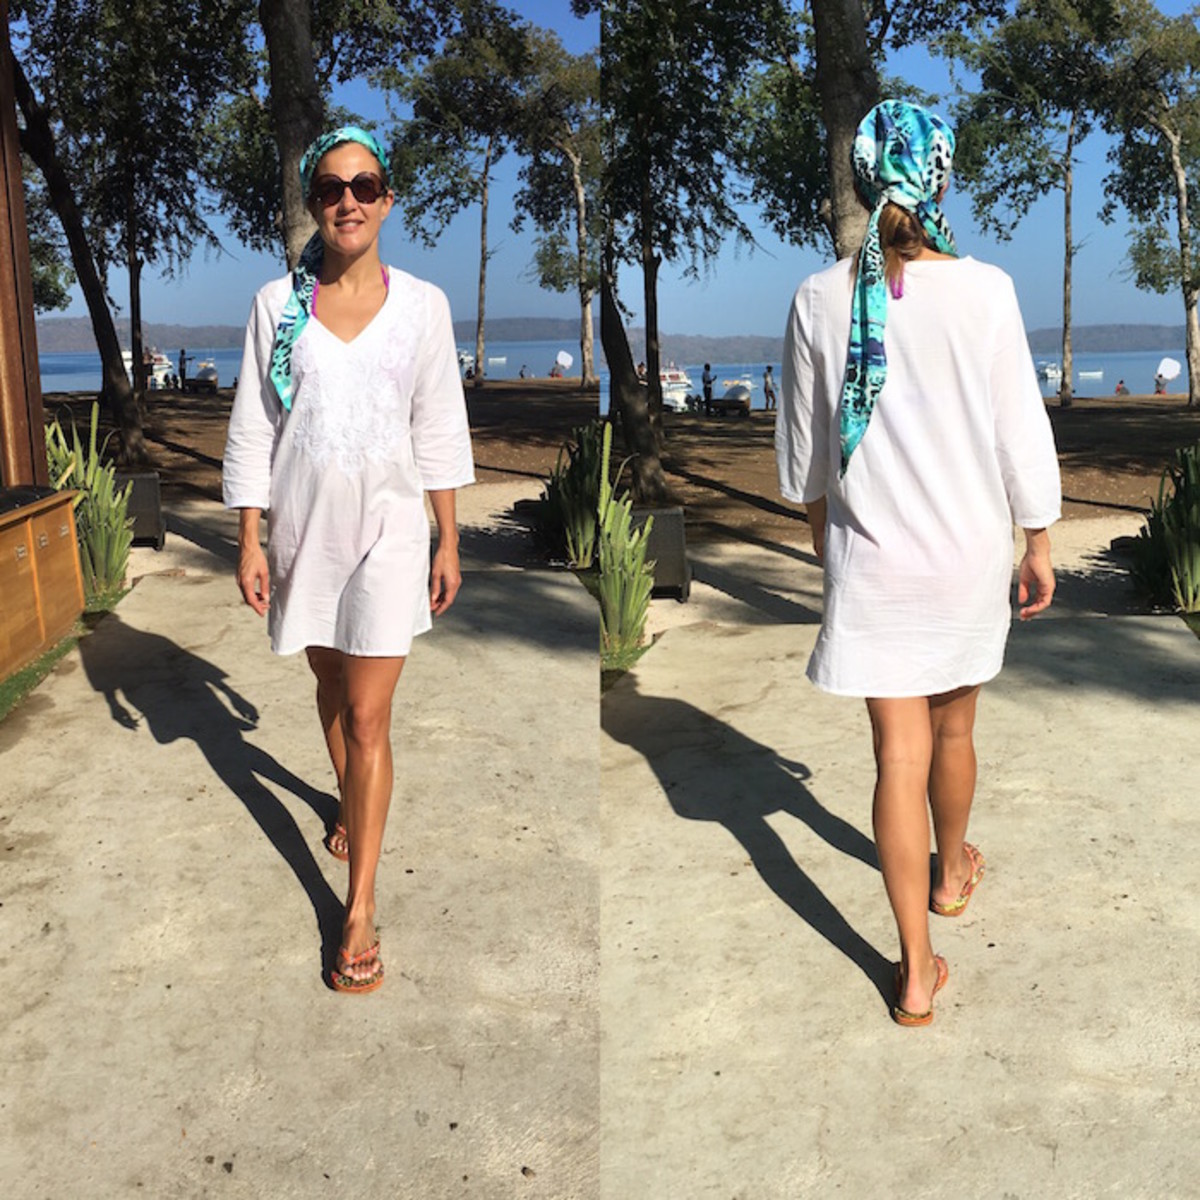 cute swimsuit with rashguard